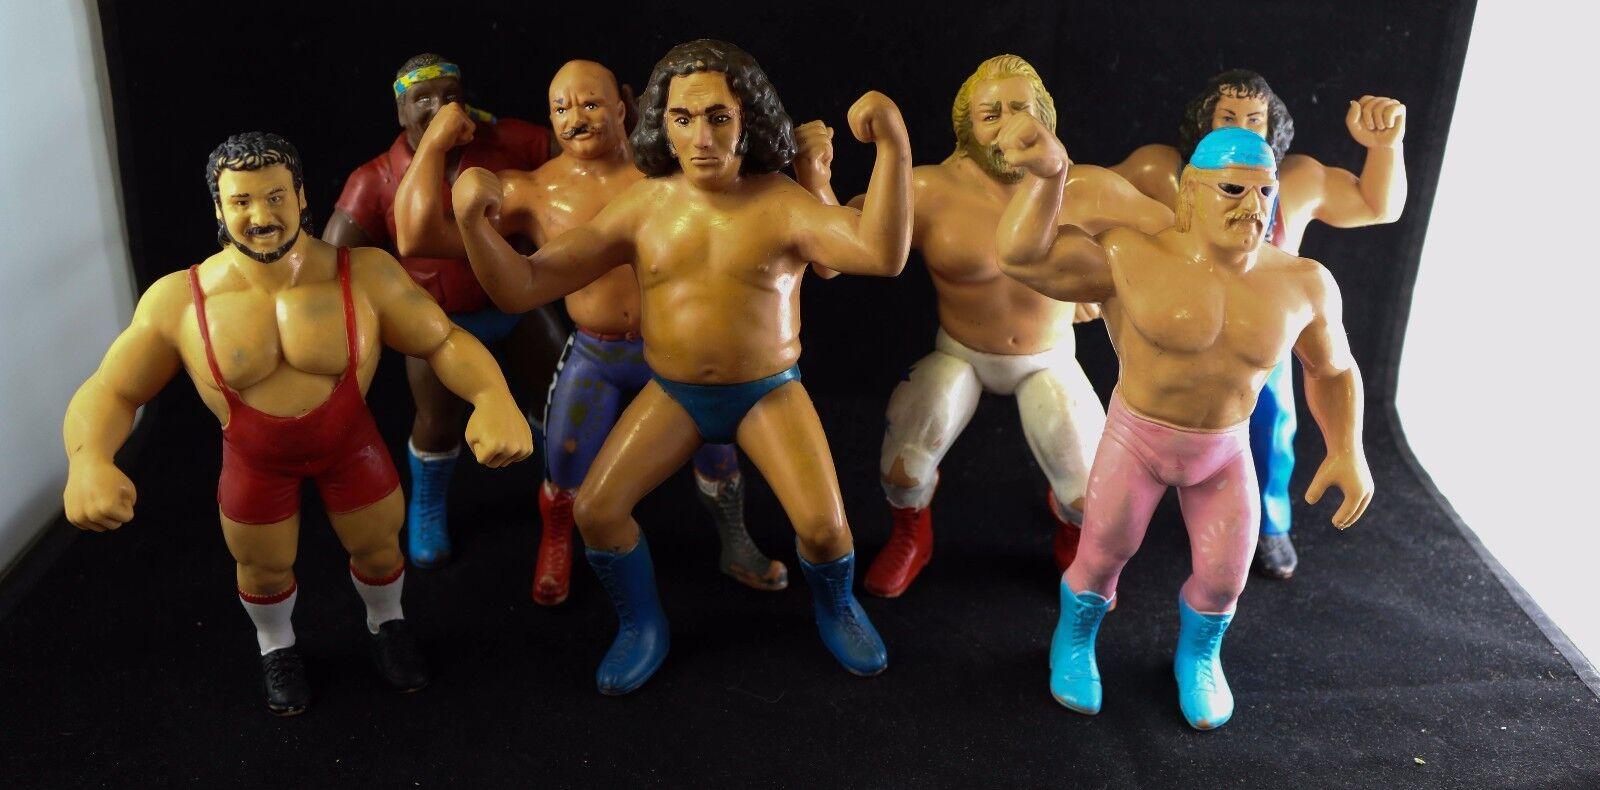 Lot of 7 Vtg 1980s Titan Sports LJN WWF Rubber Figures Ventura, Andre